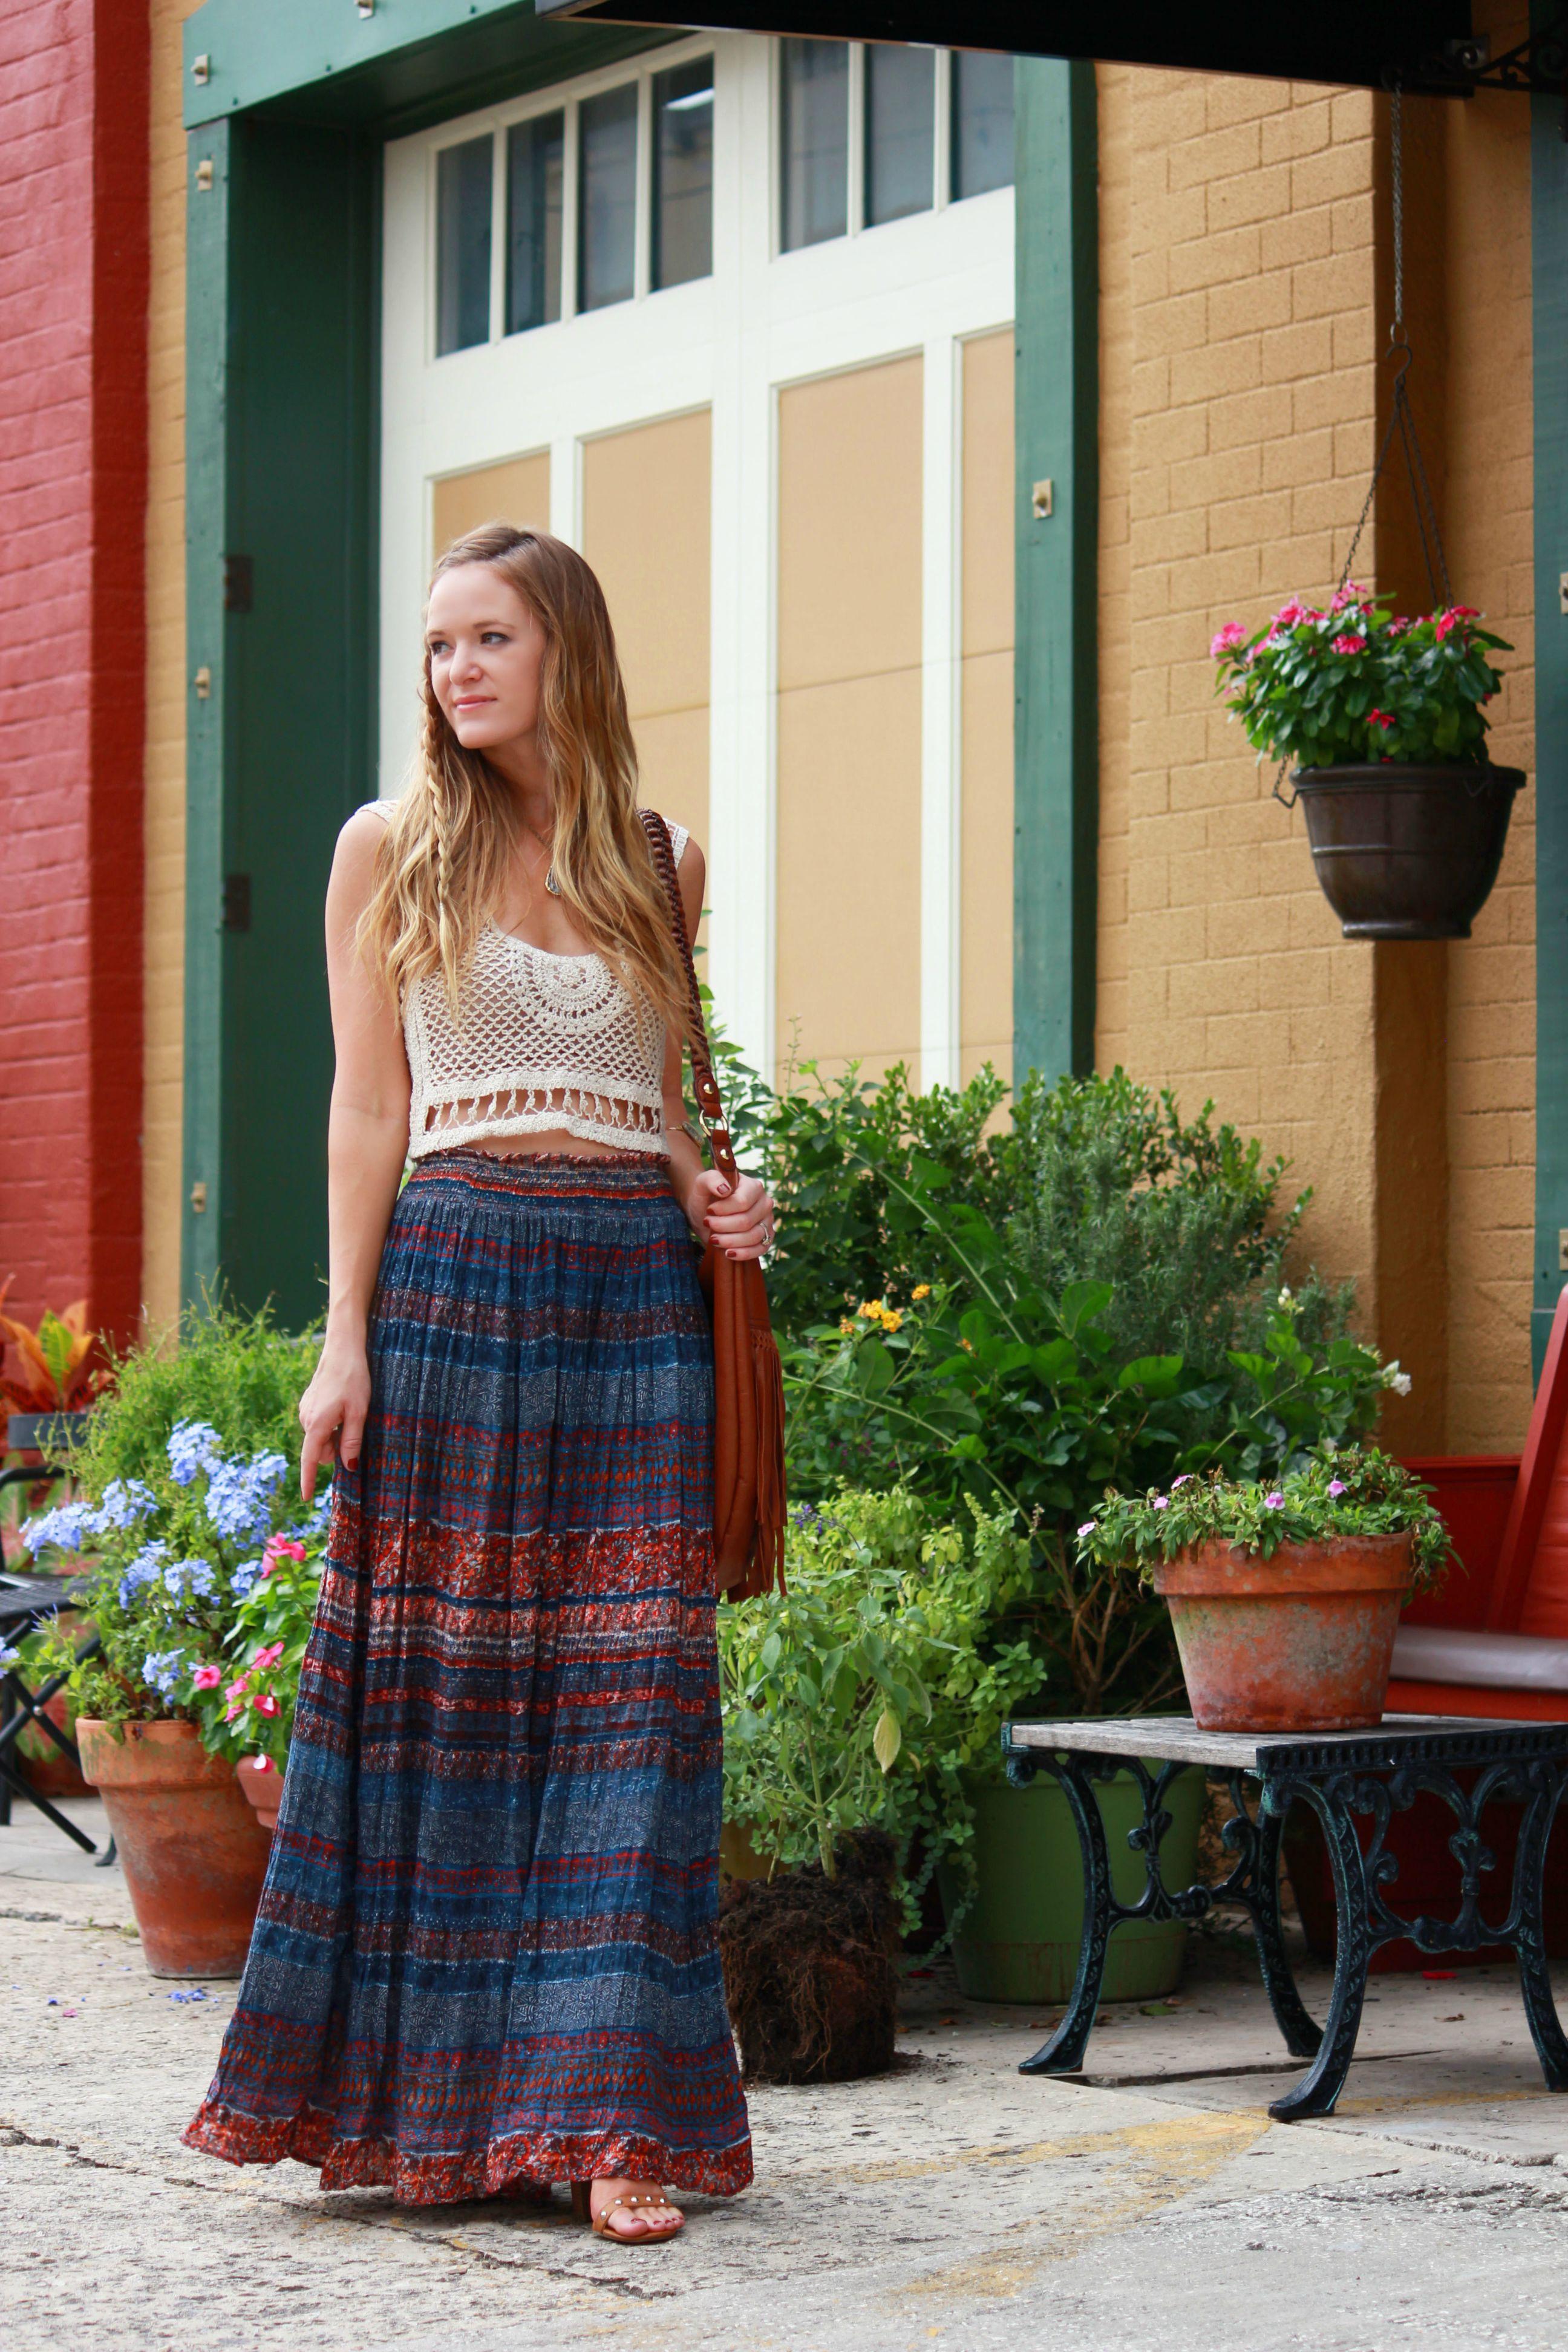 orlando/ florida fashion blog styling windsor crop top, windsor maxi skirt, h&m fringe bag for bohemian casual outfit